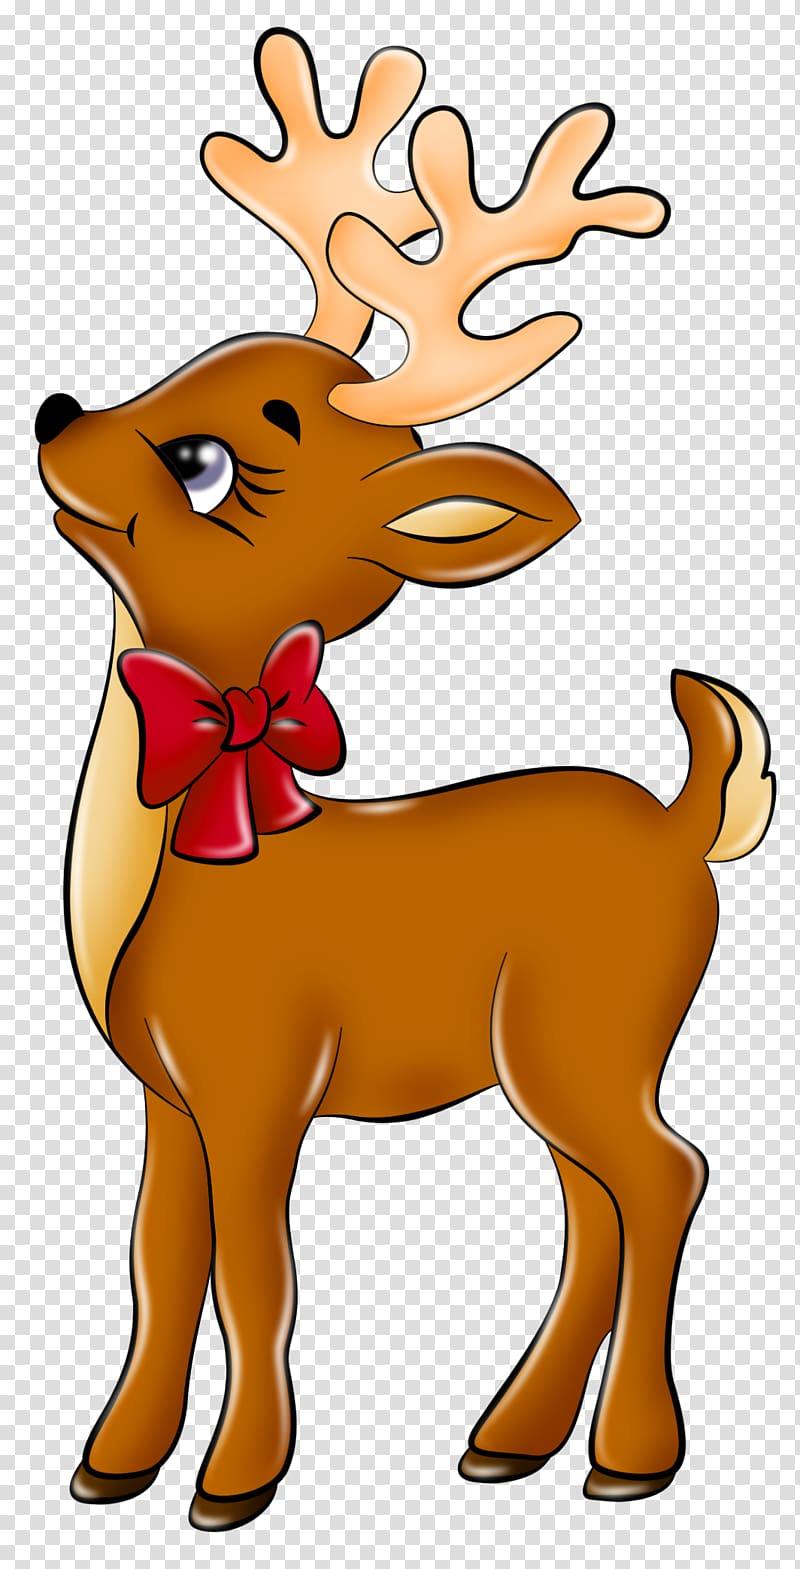 Rusa Rudolph Santa Claus, Rusa Lucu, rusa dengan pita merah png